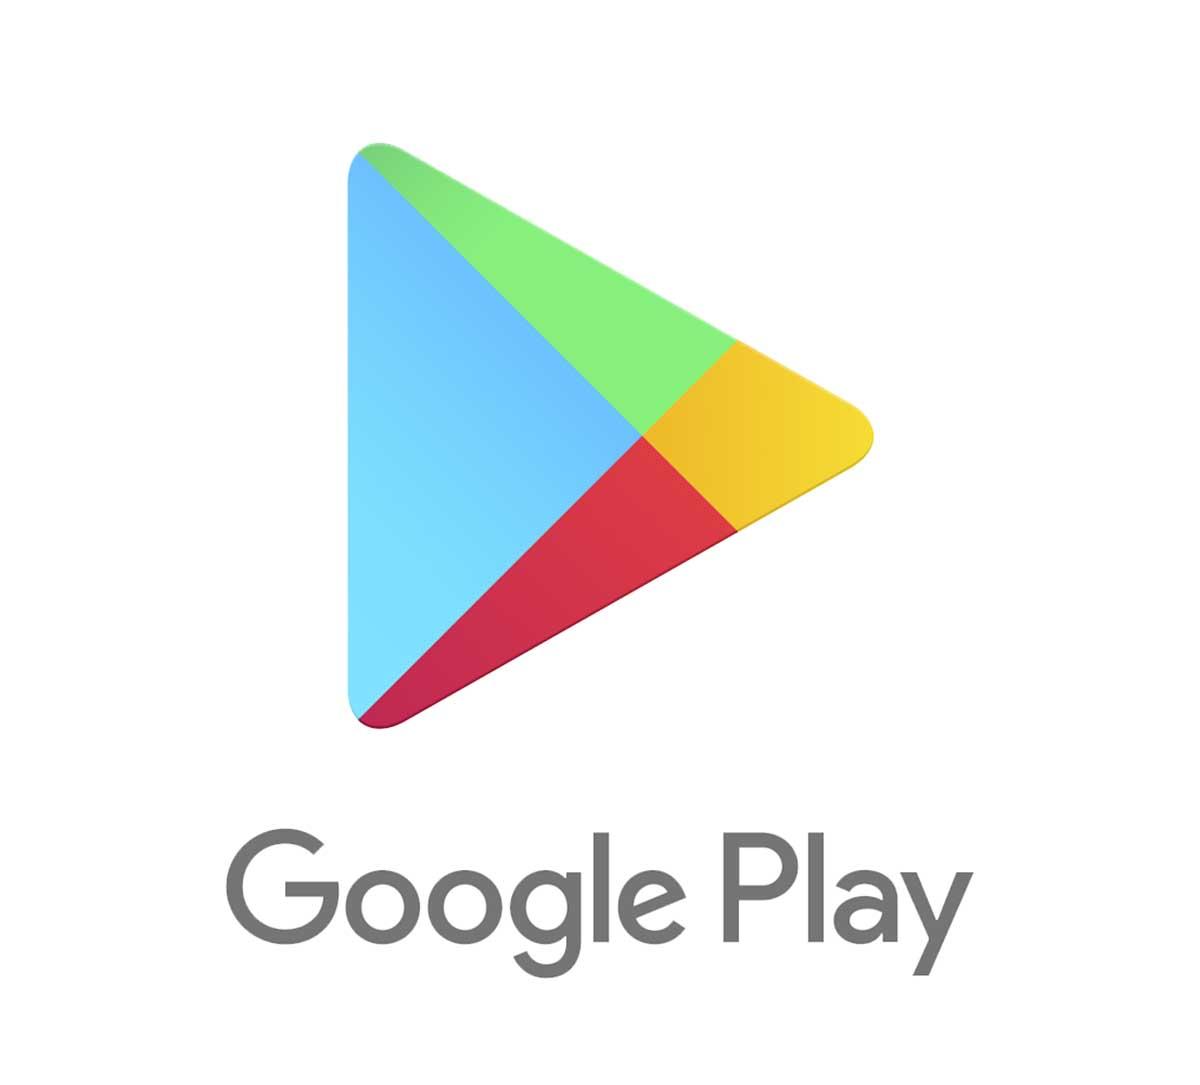 Descubren apps para niños en Google Play Store repletas de violencia